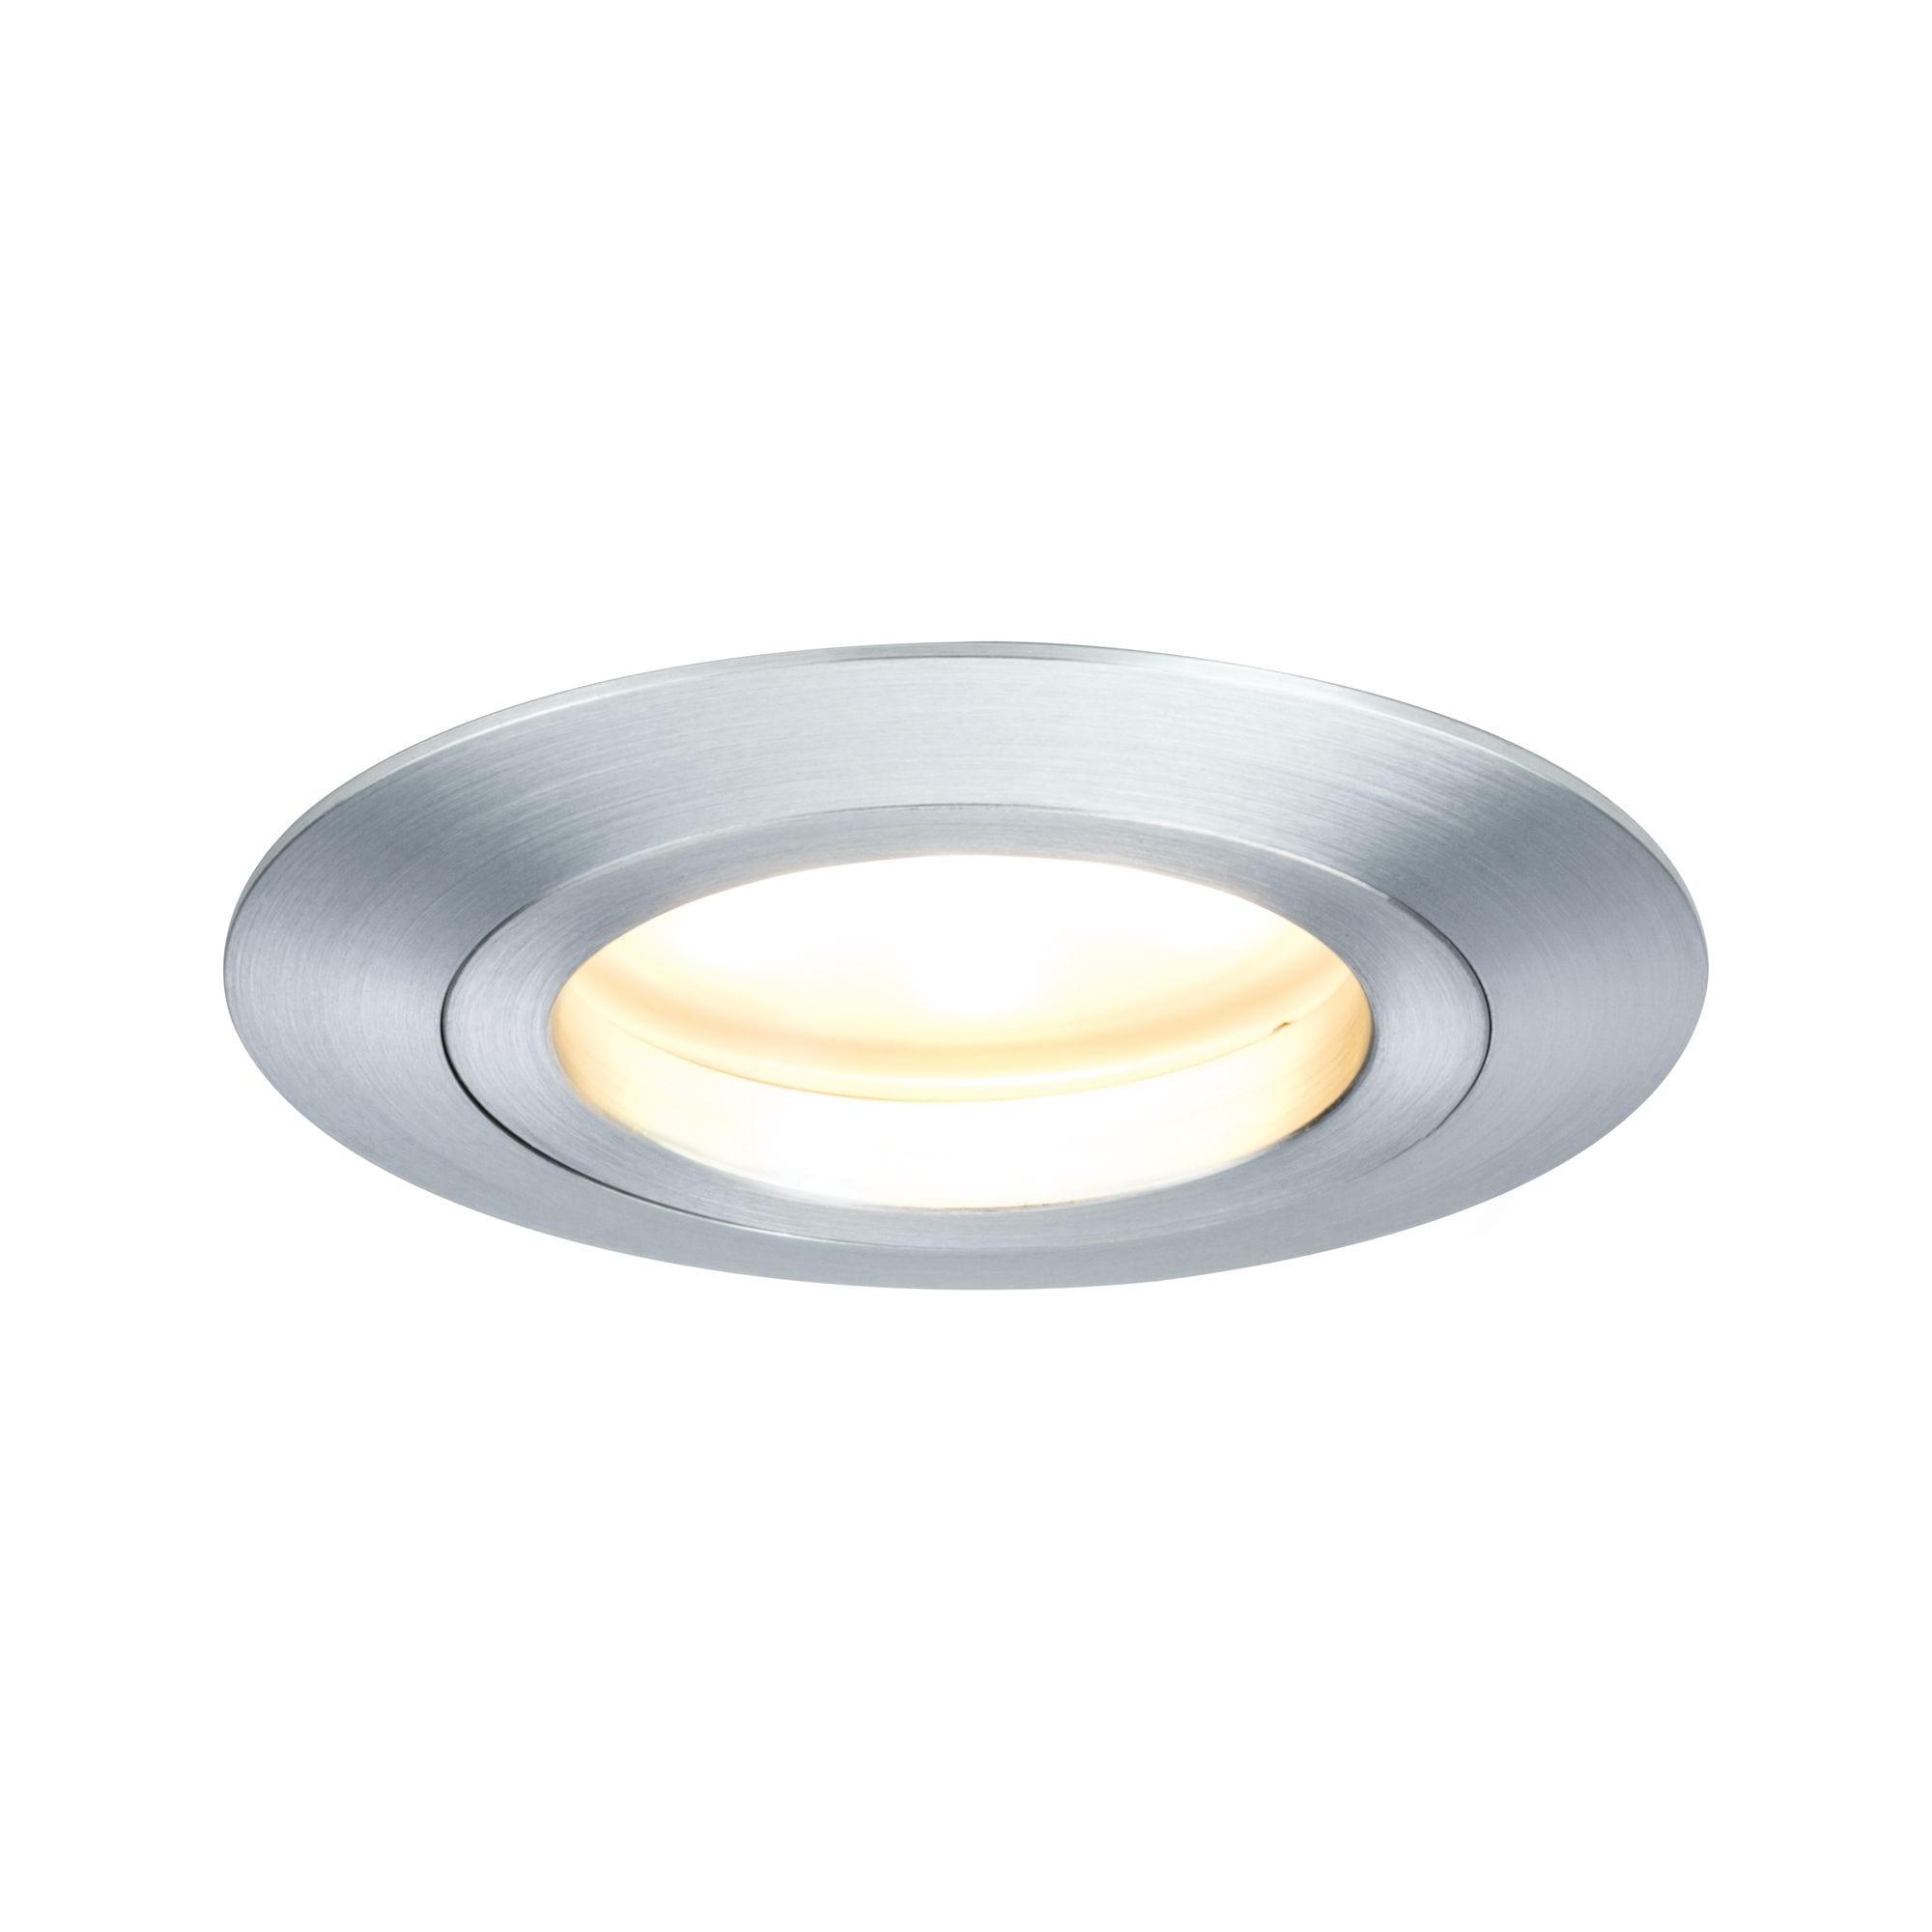 Paulmann LED Einbaustrahler Coin satiniert rund 7W Alu 3er-Set dimmbar, 3 St., Warmweiß